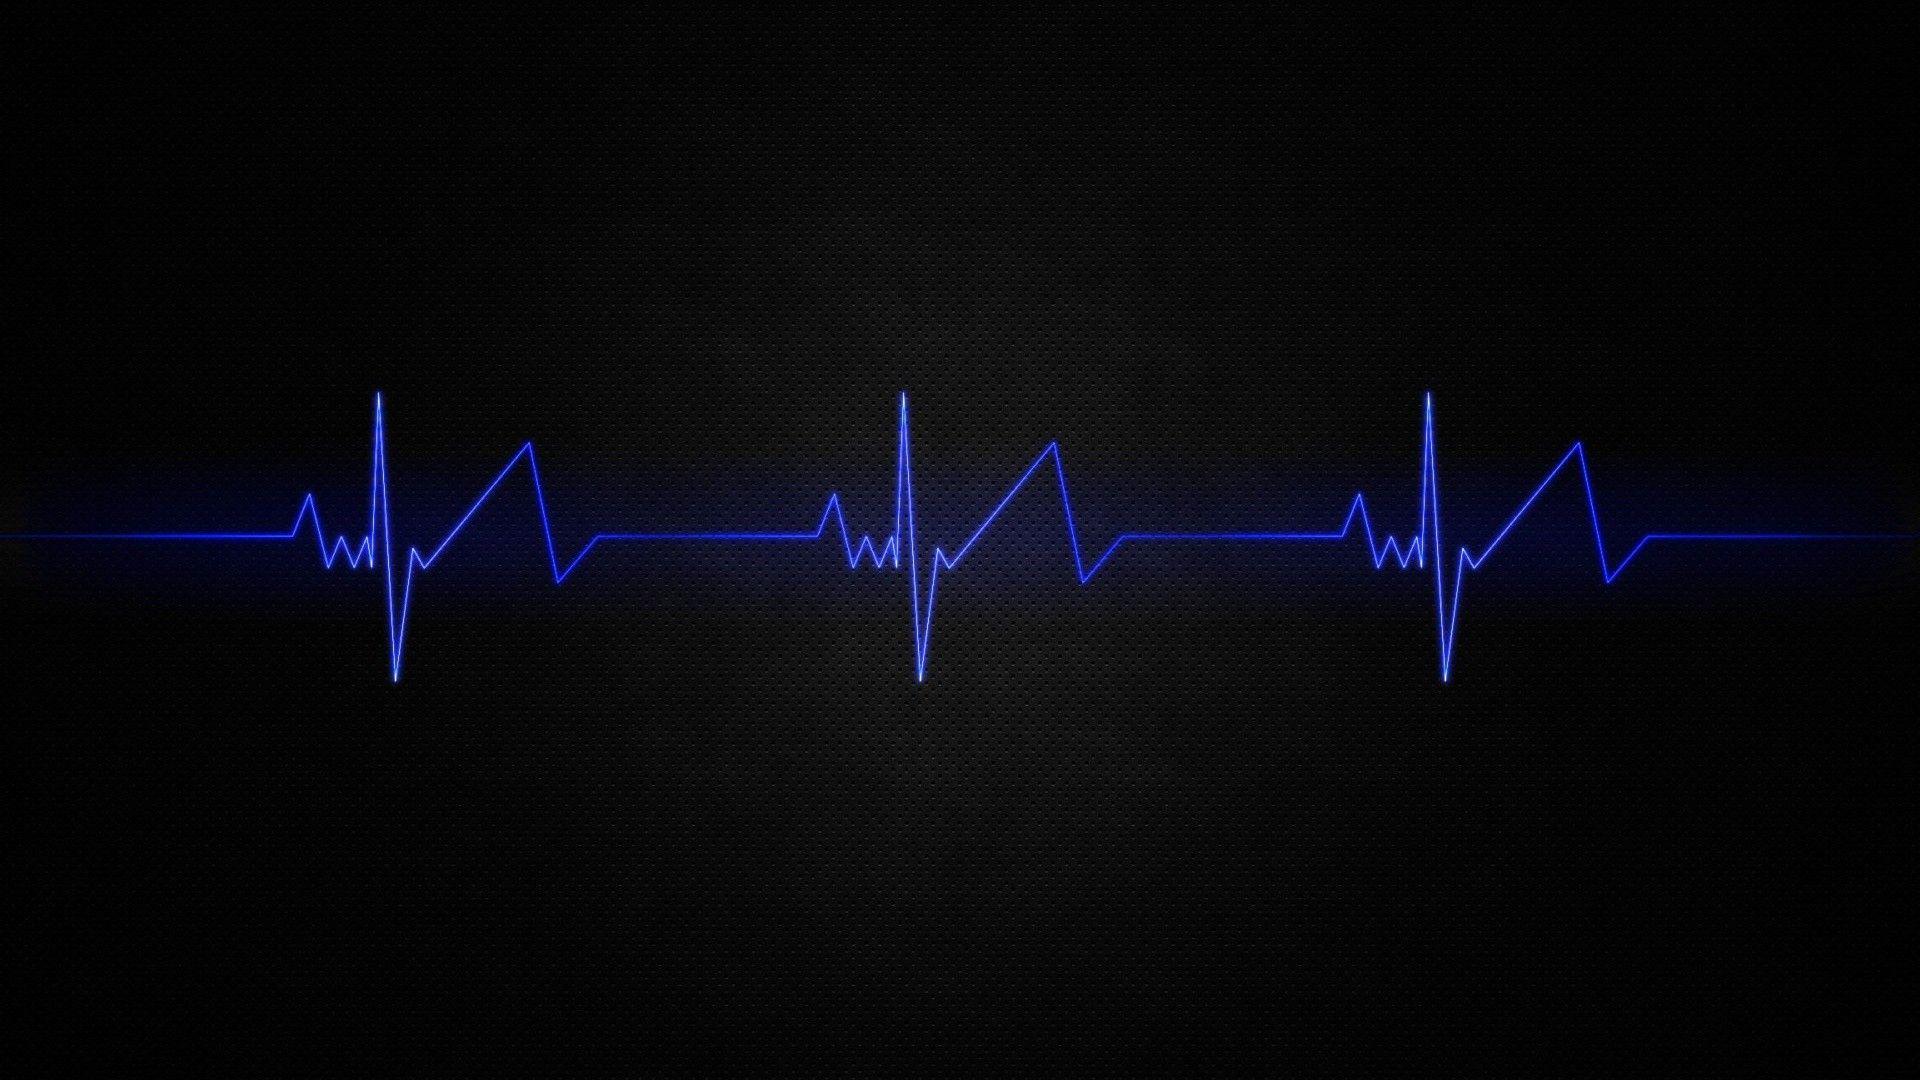 Beautiful Heartbeat Wallpaper 1920x1080 Hd Beats Wallpaper Blue